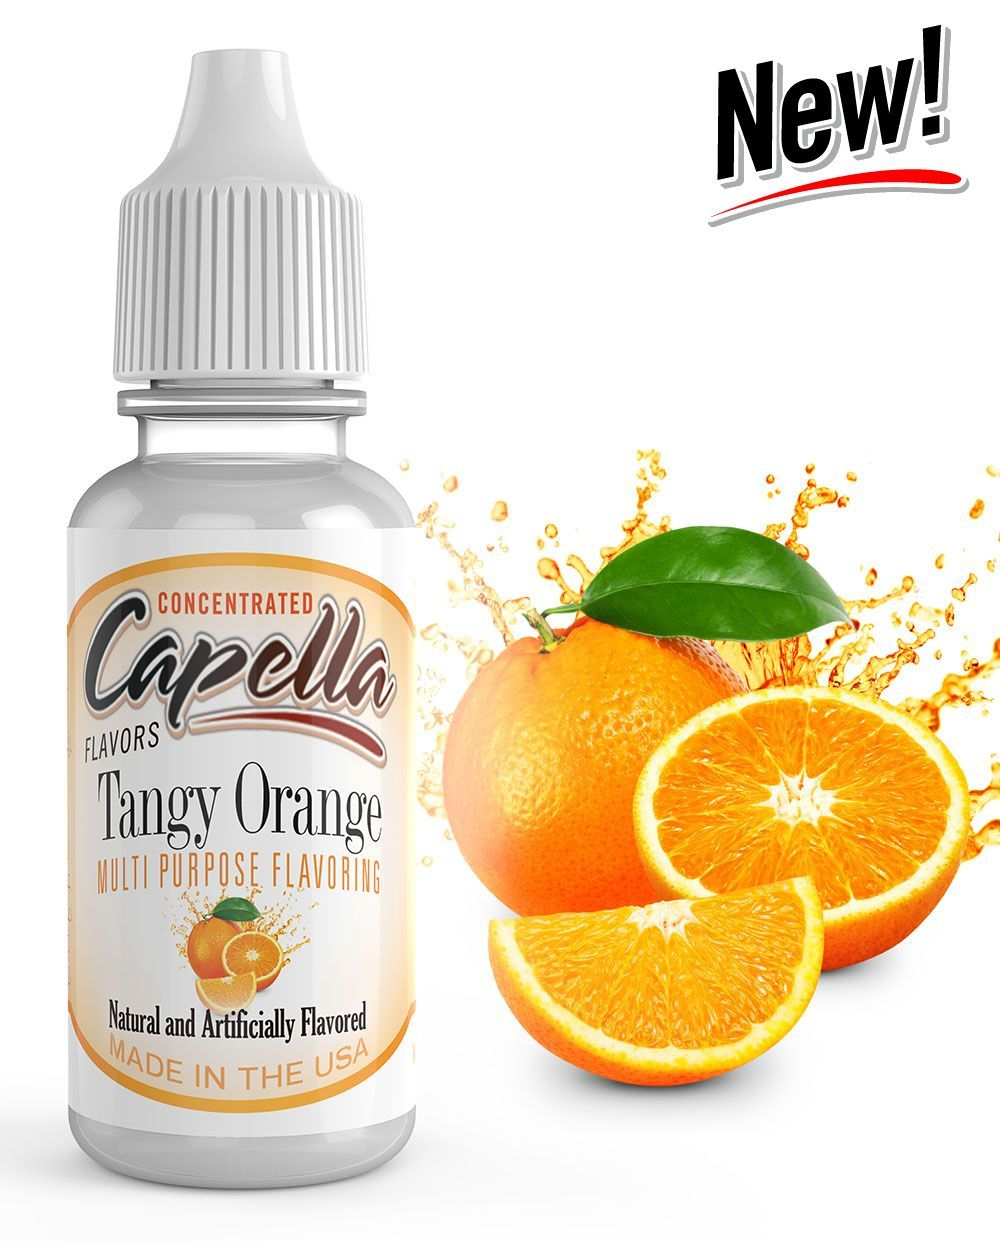 ŠŤAVNATÝ POMARANČ / Tangy Orange - Aróma Capella 13 ml